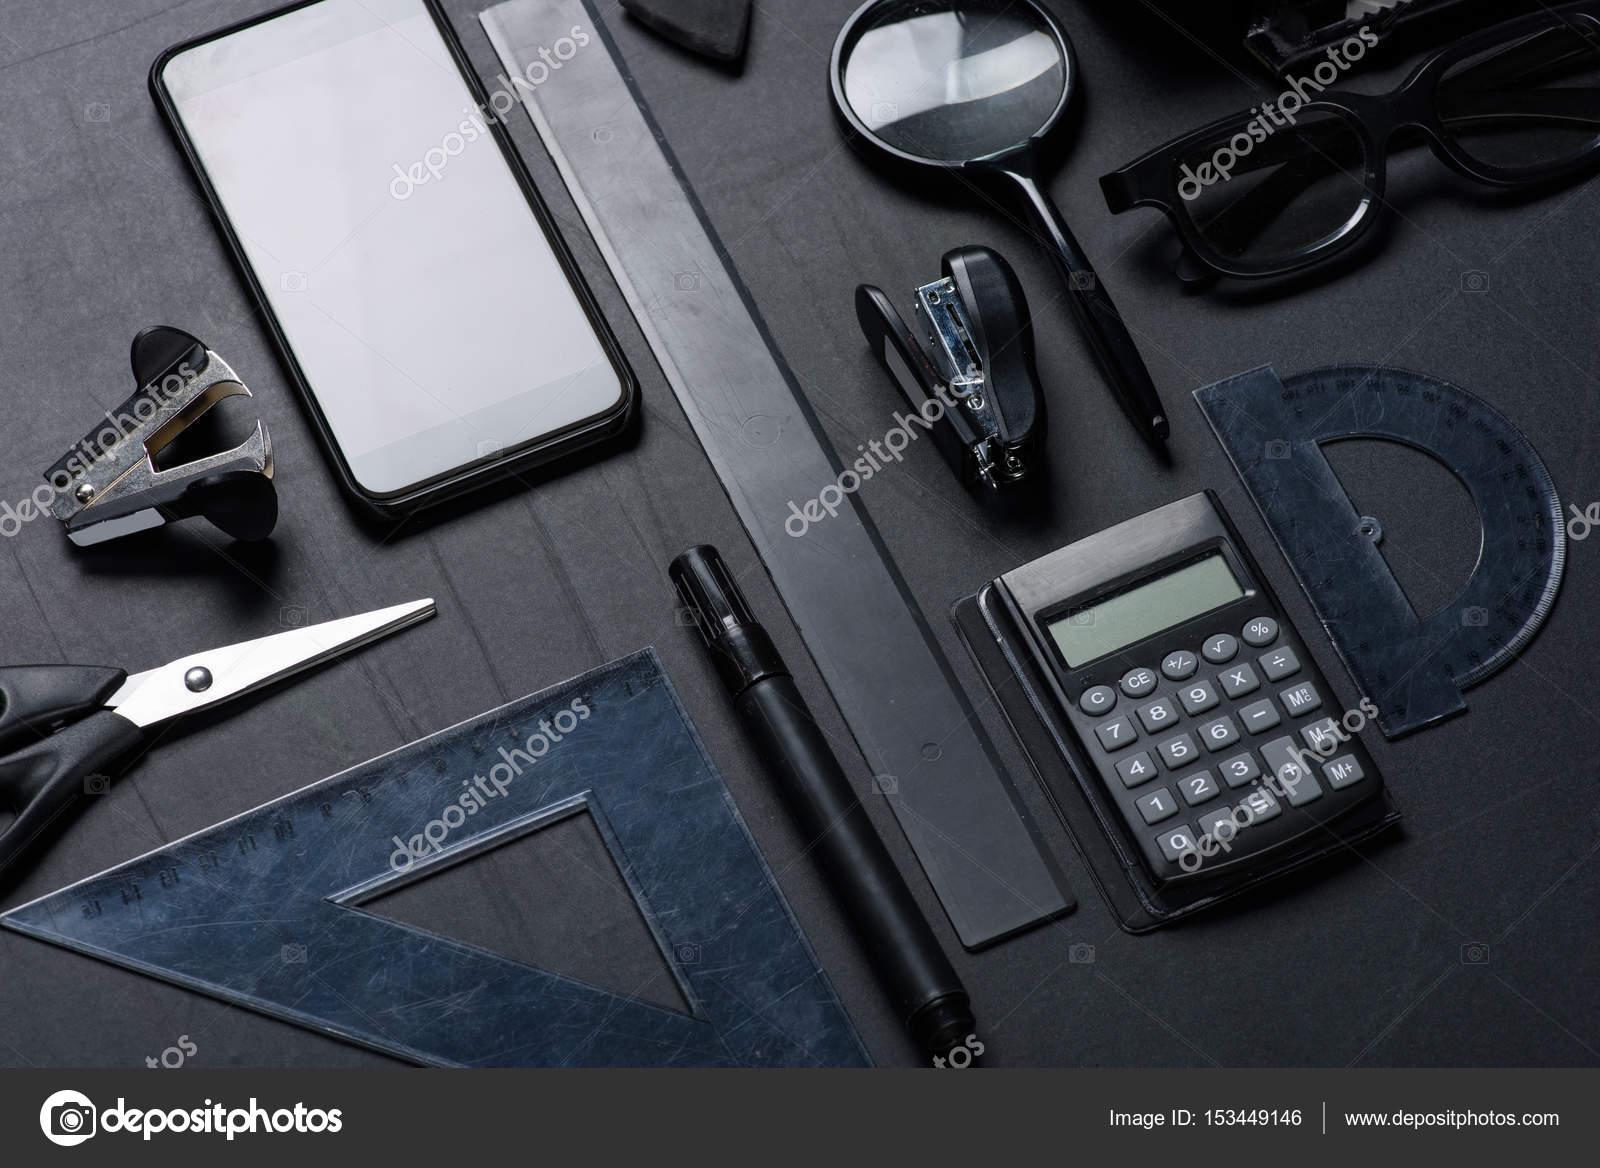 smartphone avec divers ustensiles de bureau photographie arturverkhovetskiy 153449146. Black Bedroom Furniture Sets. Home Design Ideas